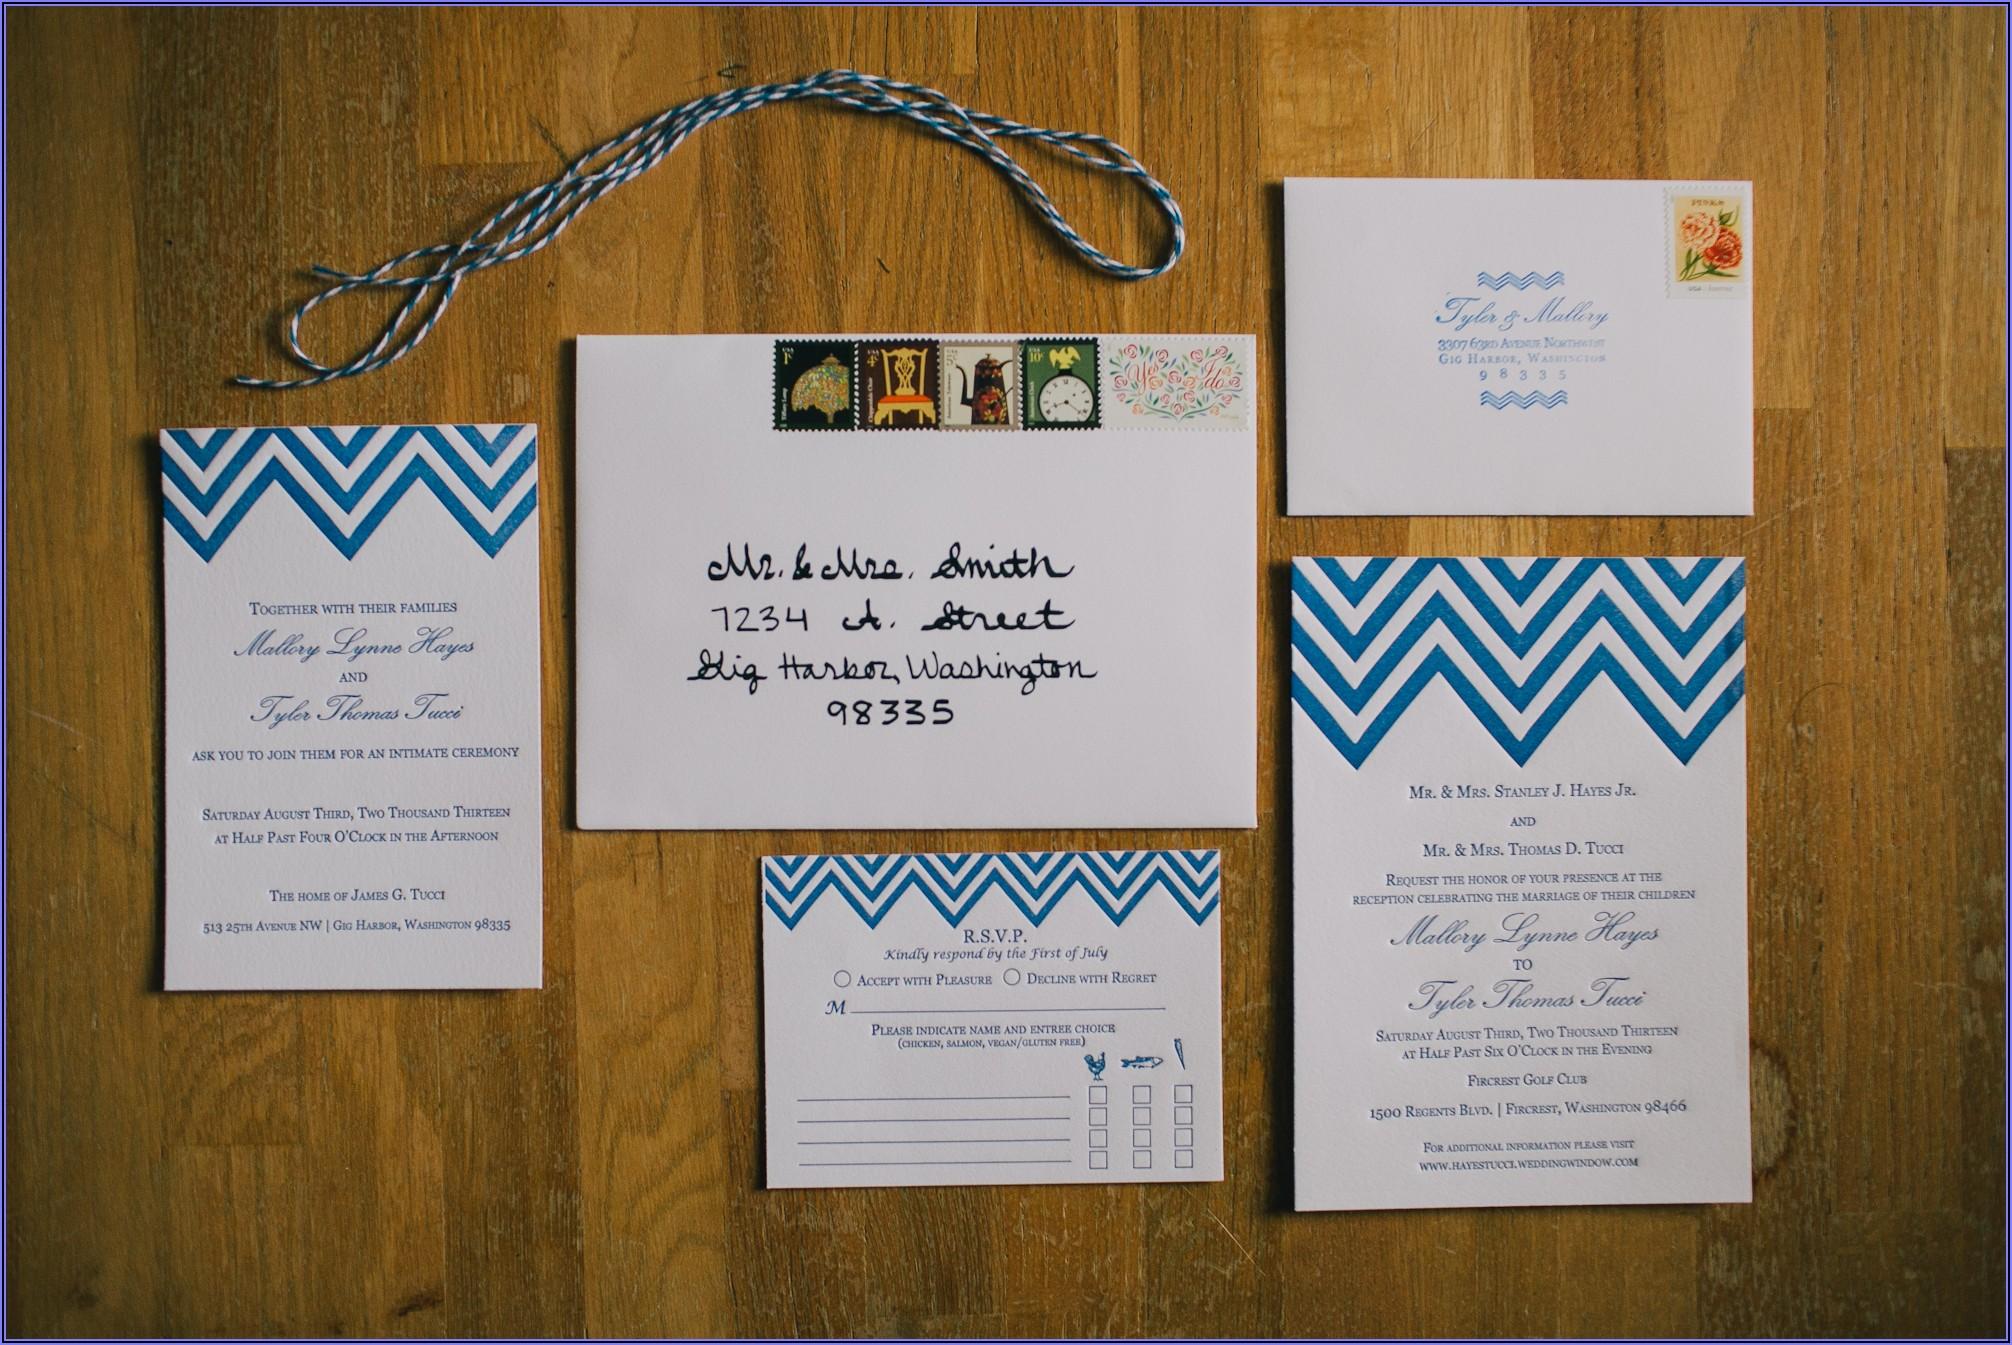 Wedding Invitation Rsvp Envelope Etiquette